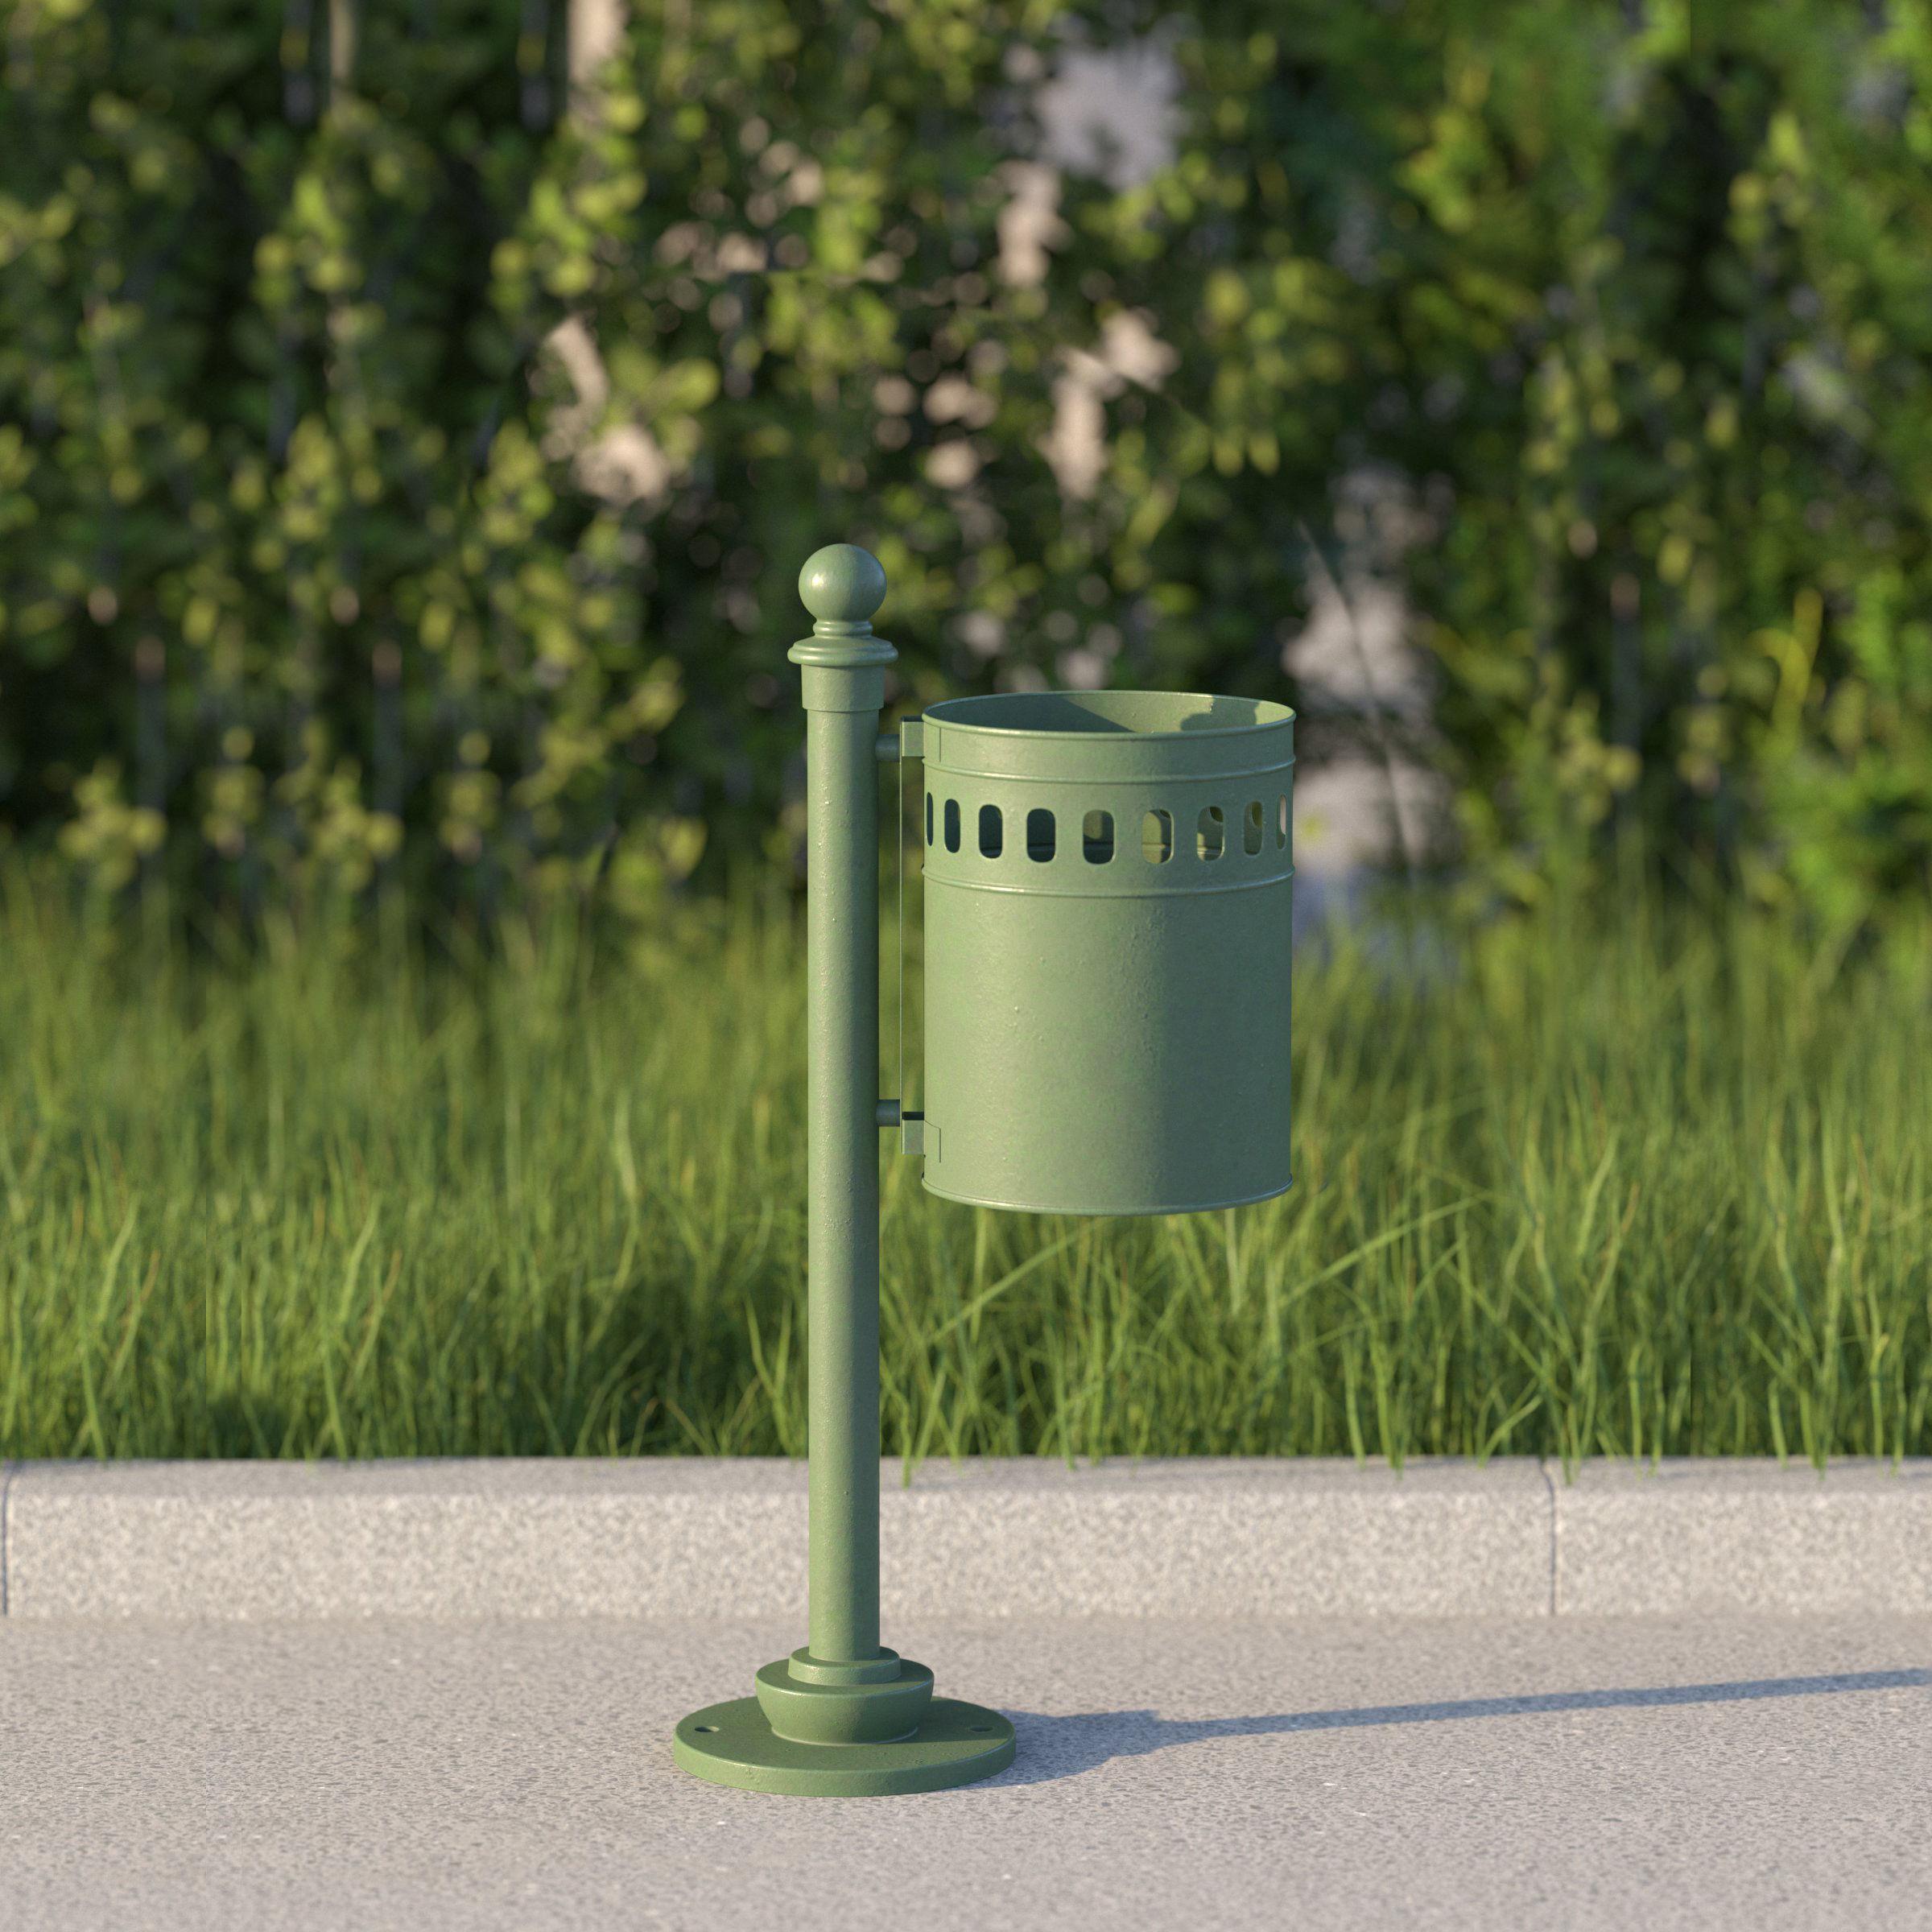 vienna public dustbin